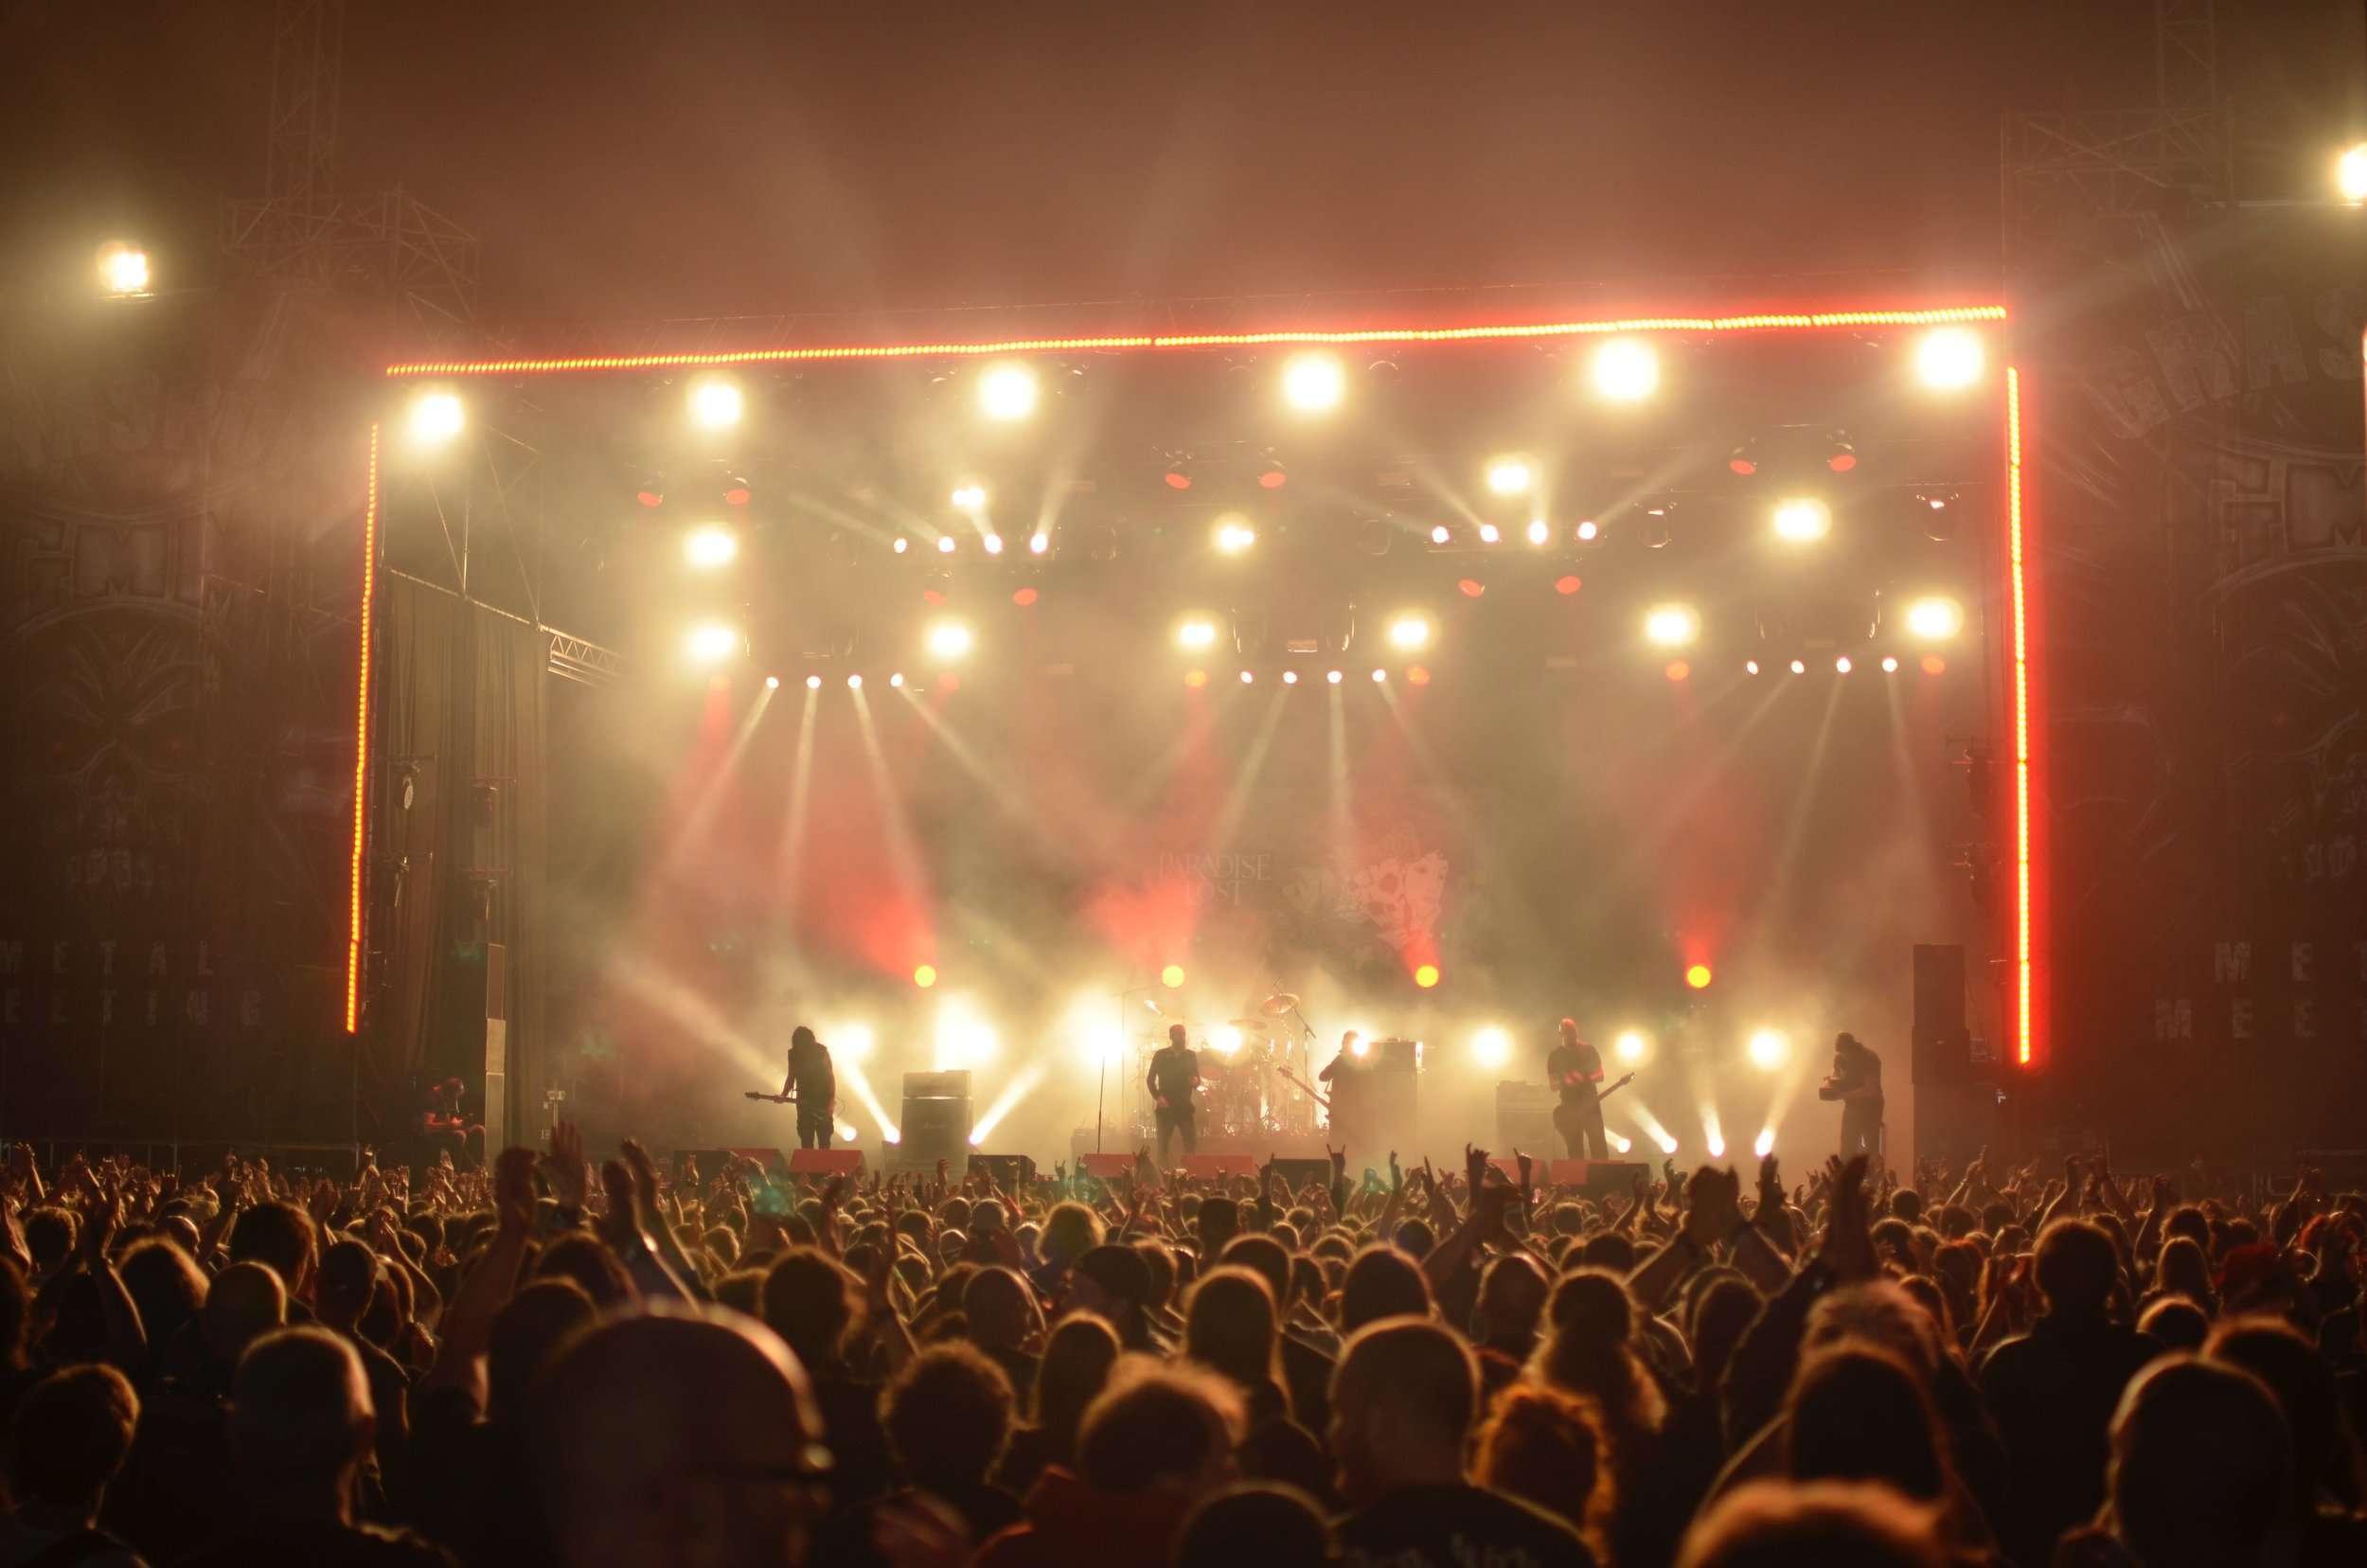 audience-band-celebration-167605.jpg